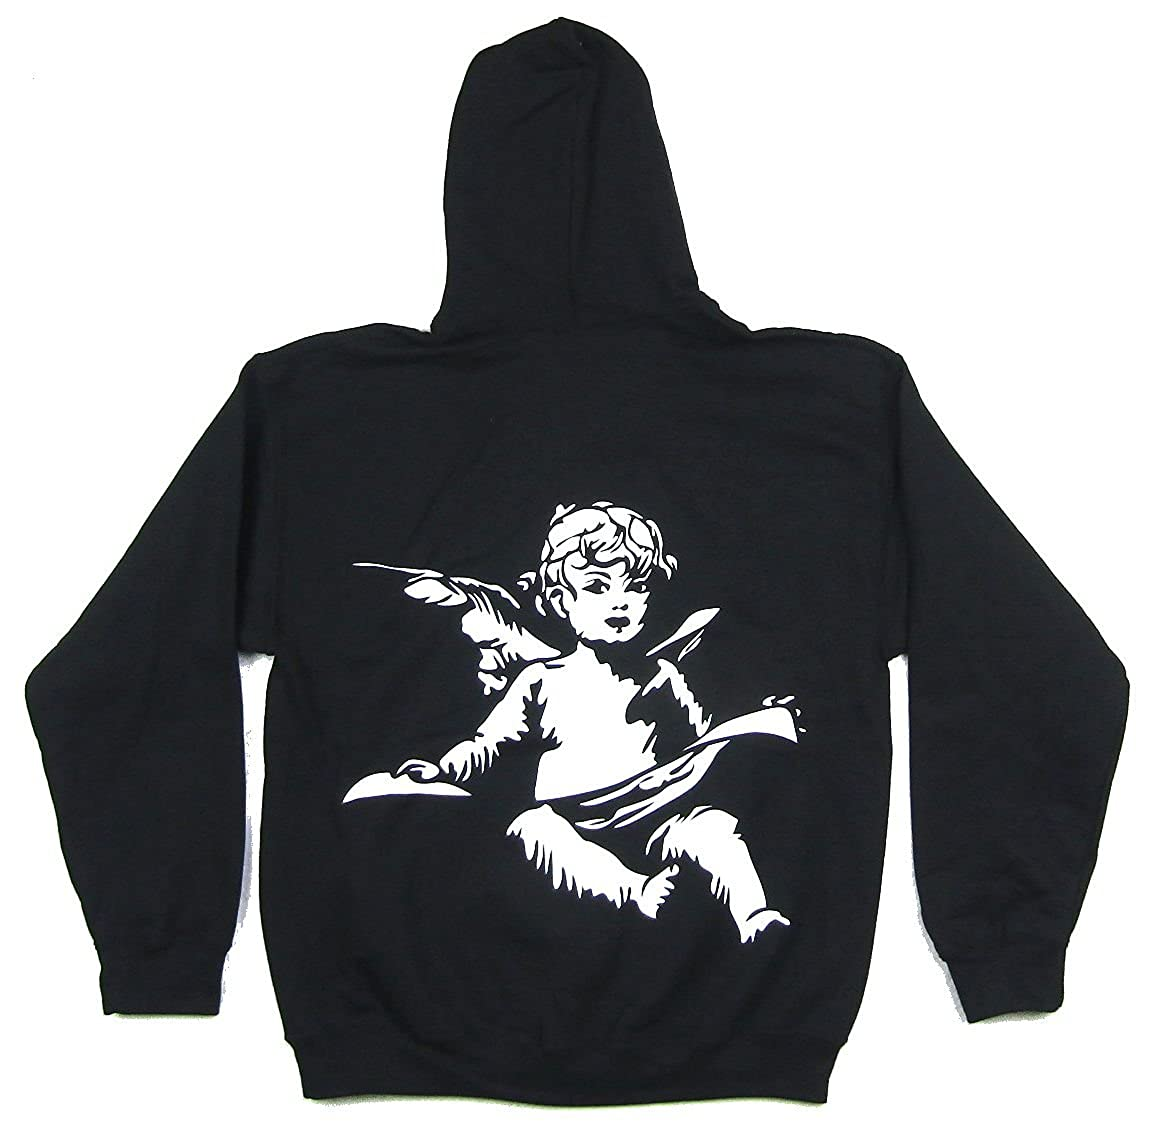 Good Music Angel Pull Over Sweatshirt Hoodie